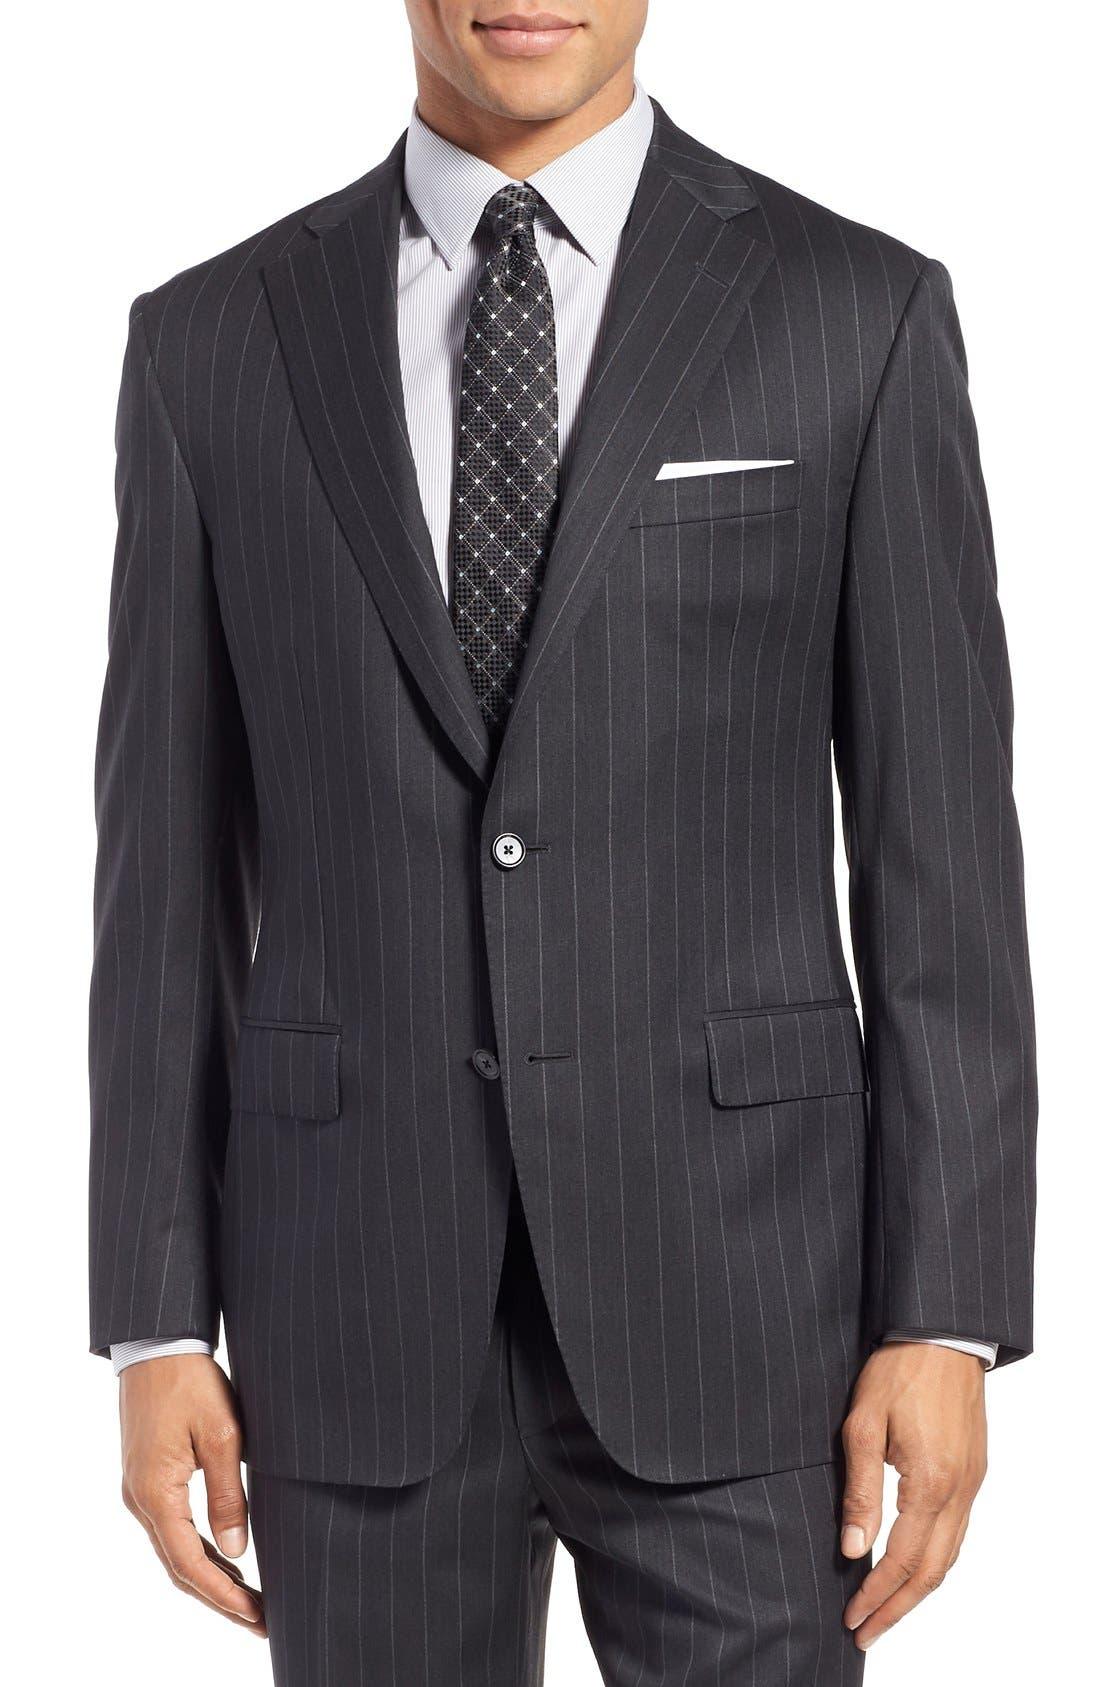 SAMUELSOHN, Classic Fit Stripe Wool Suit, Alternate thumbnail 4, color, 025